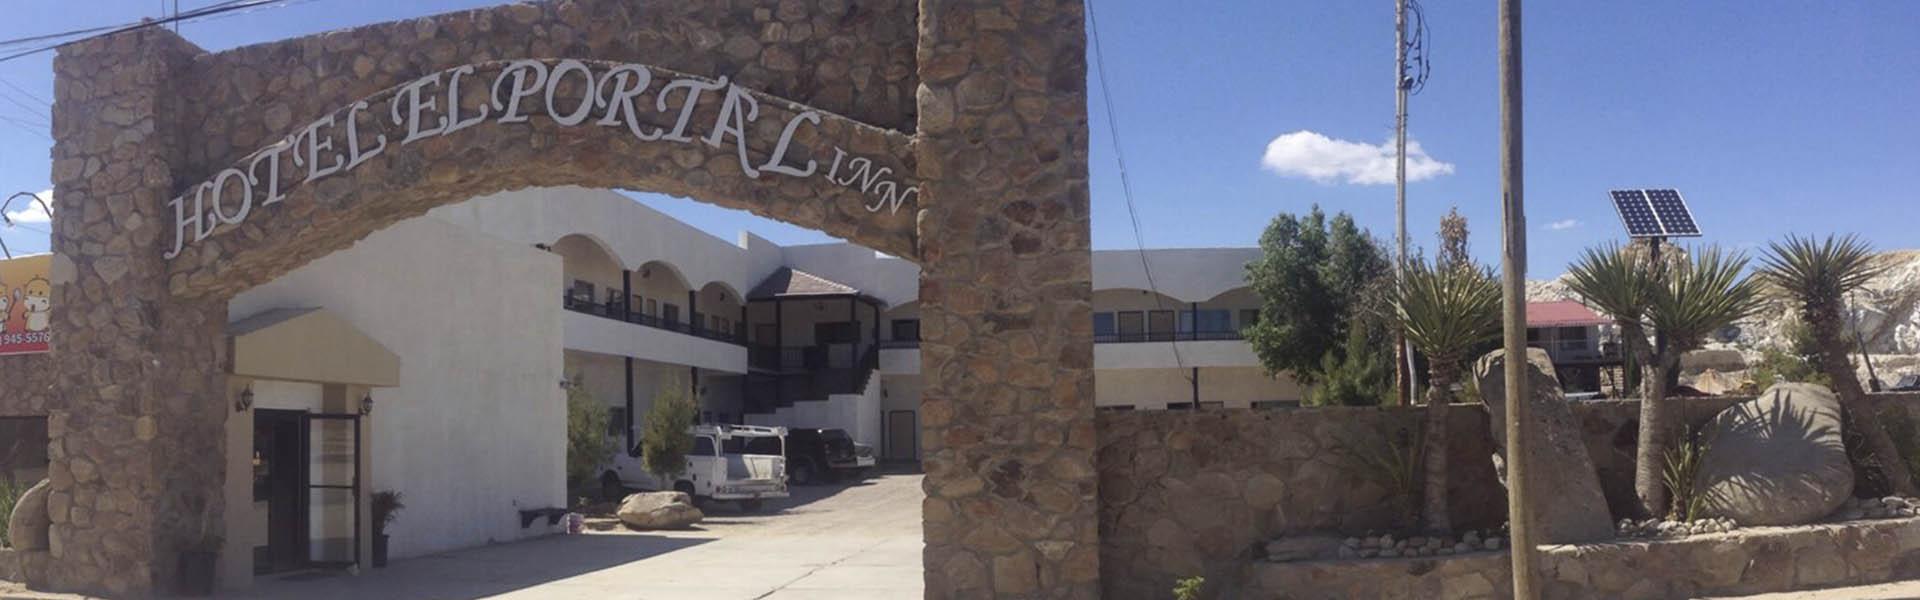 Hotel Portal Inn